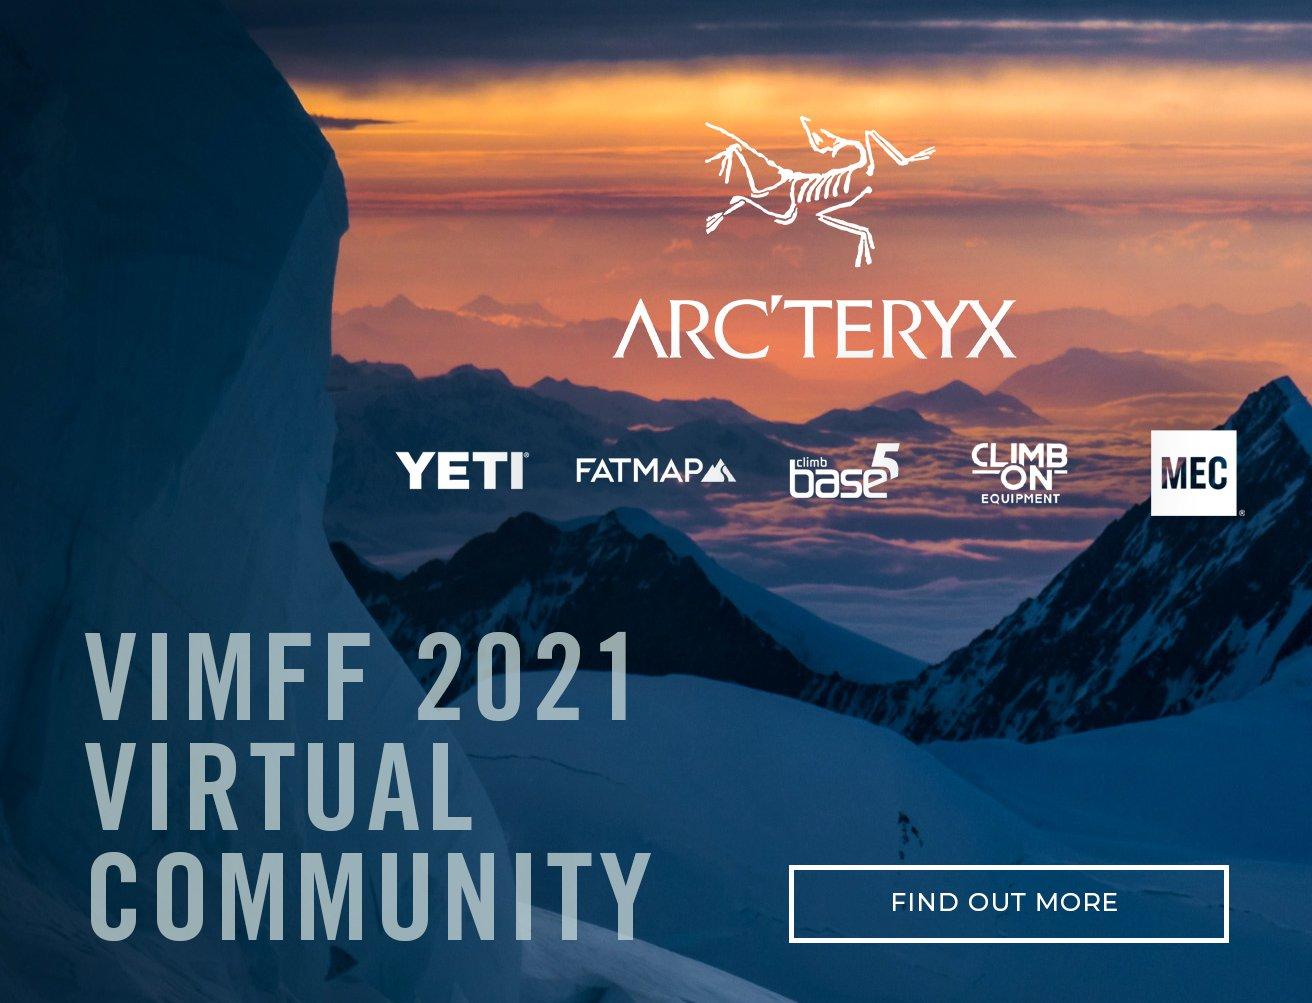 vimff virtual community cta